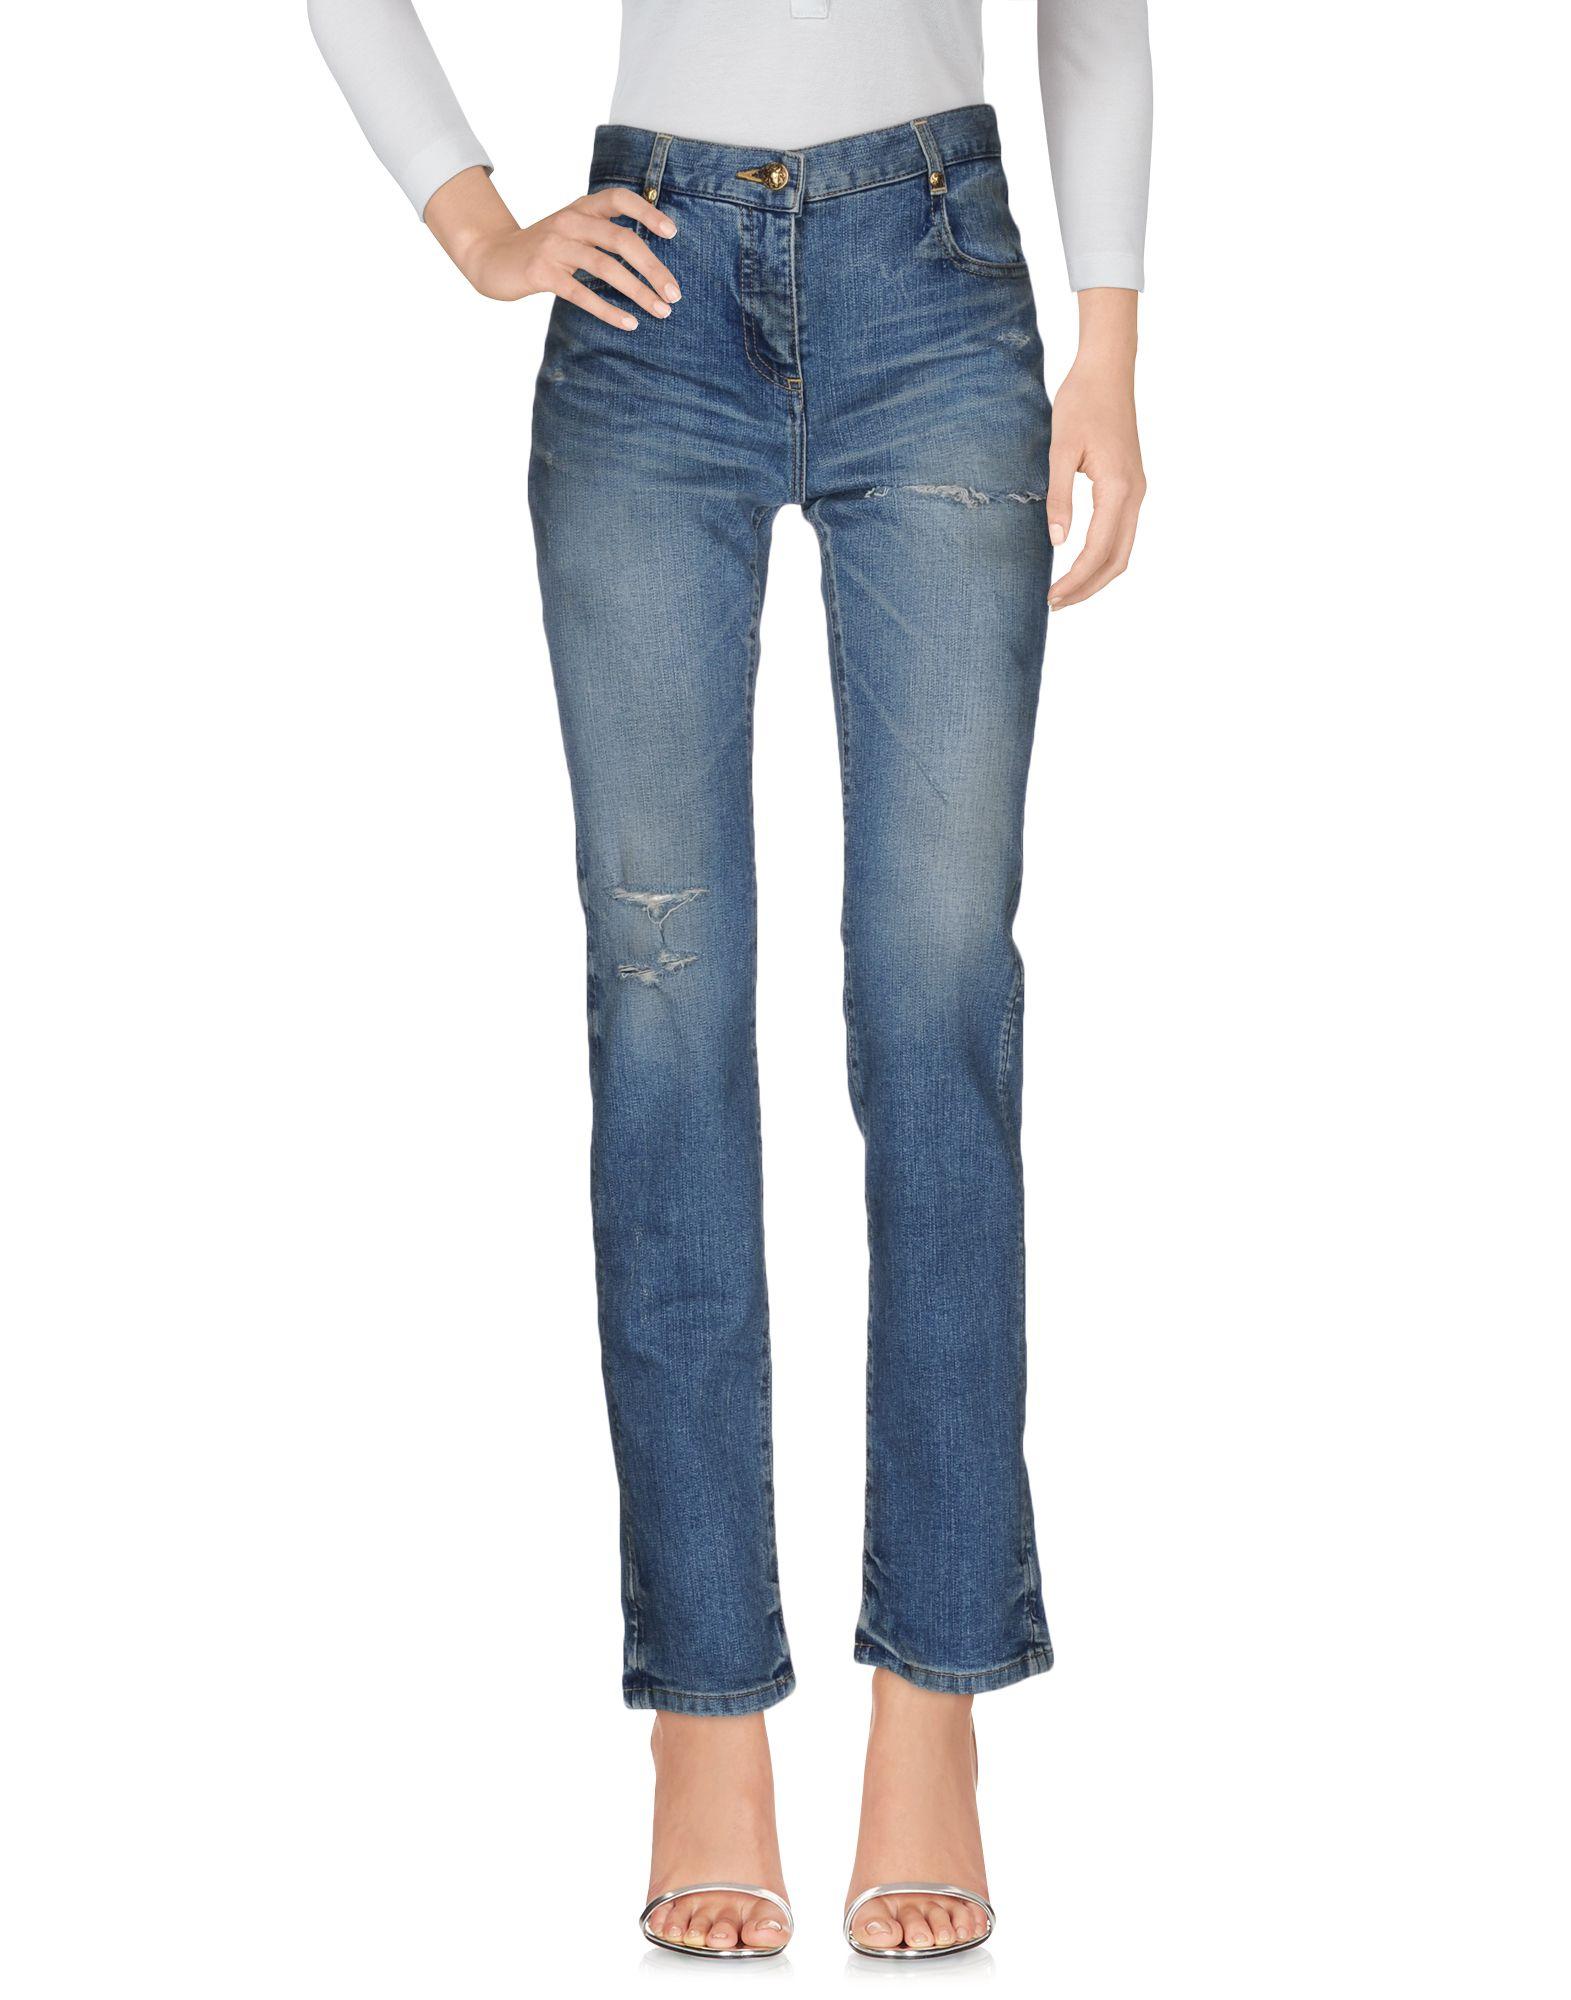 Pantaloni Jeans Balmain Donna - Acquista online su 1nA9yhn